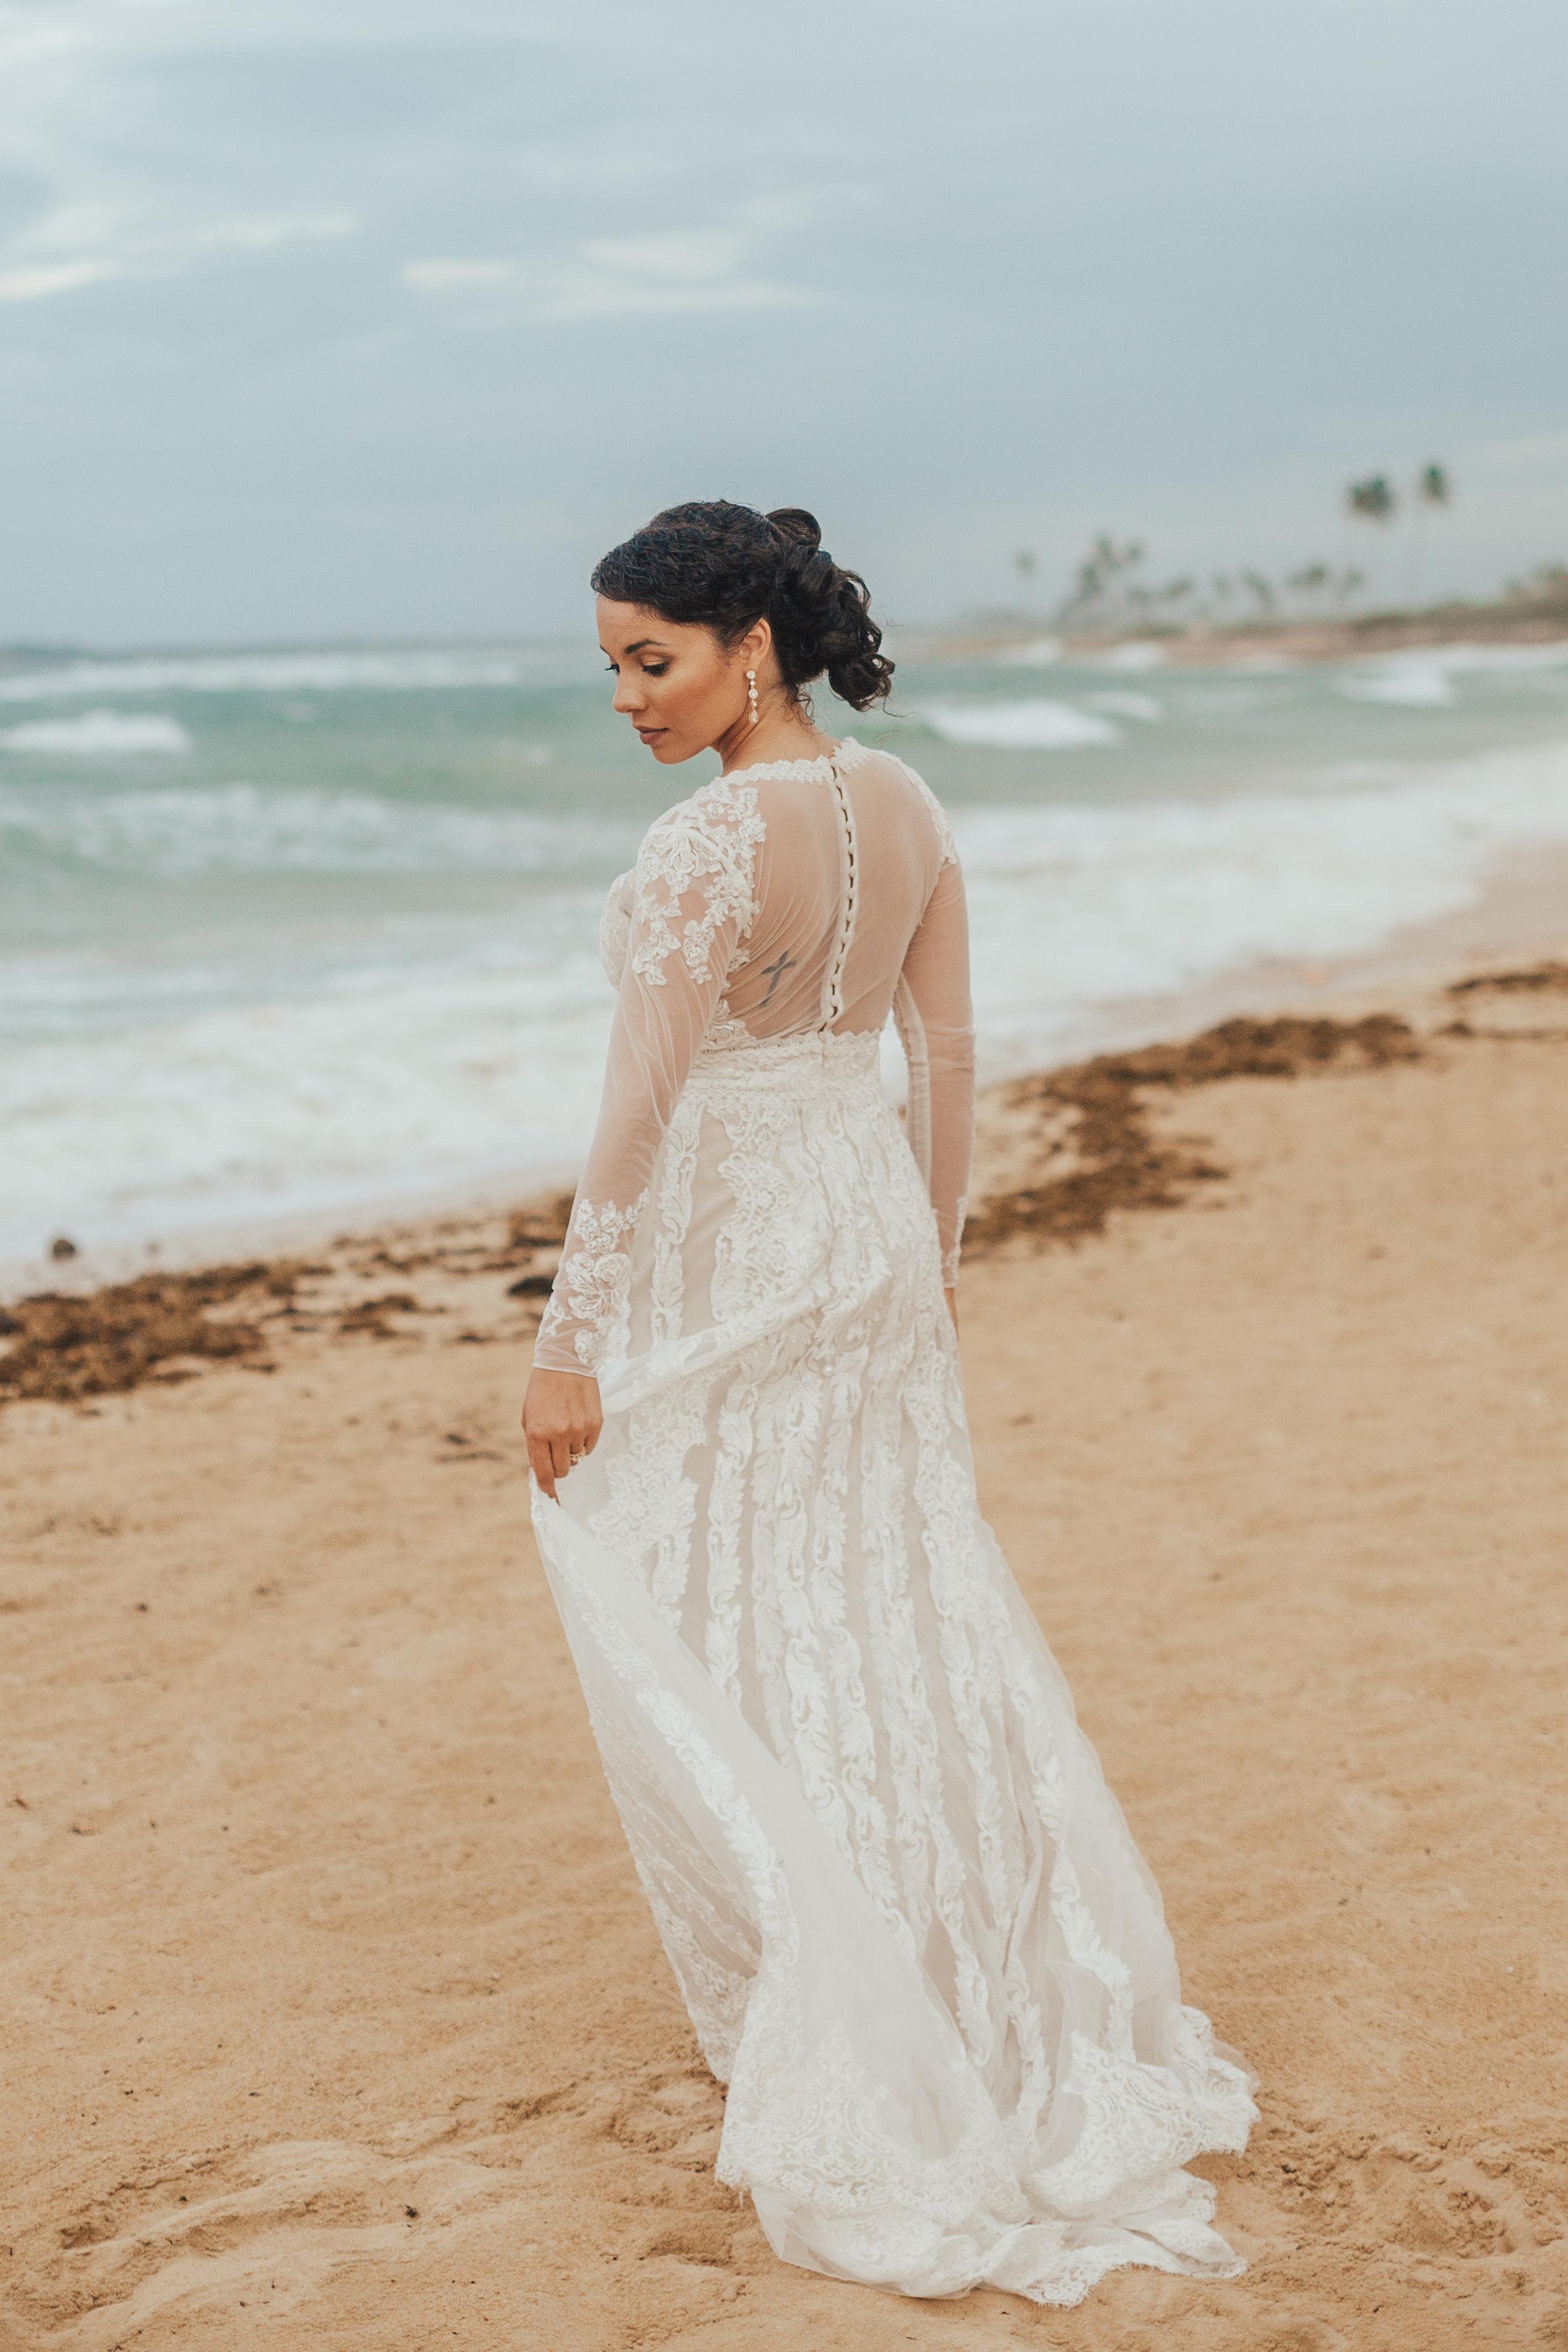 Destination-Wedding-Photographer-cleveland-wedding-photographer-elopement-photographer-beach-tulum-wedding-mexico